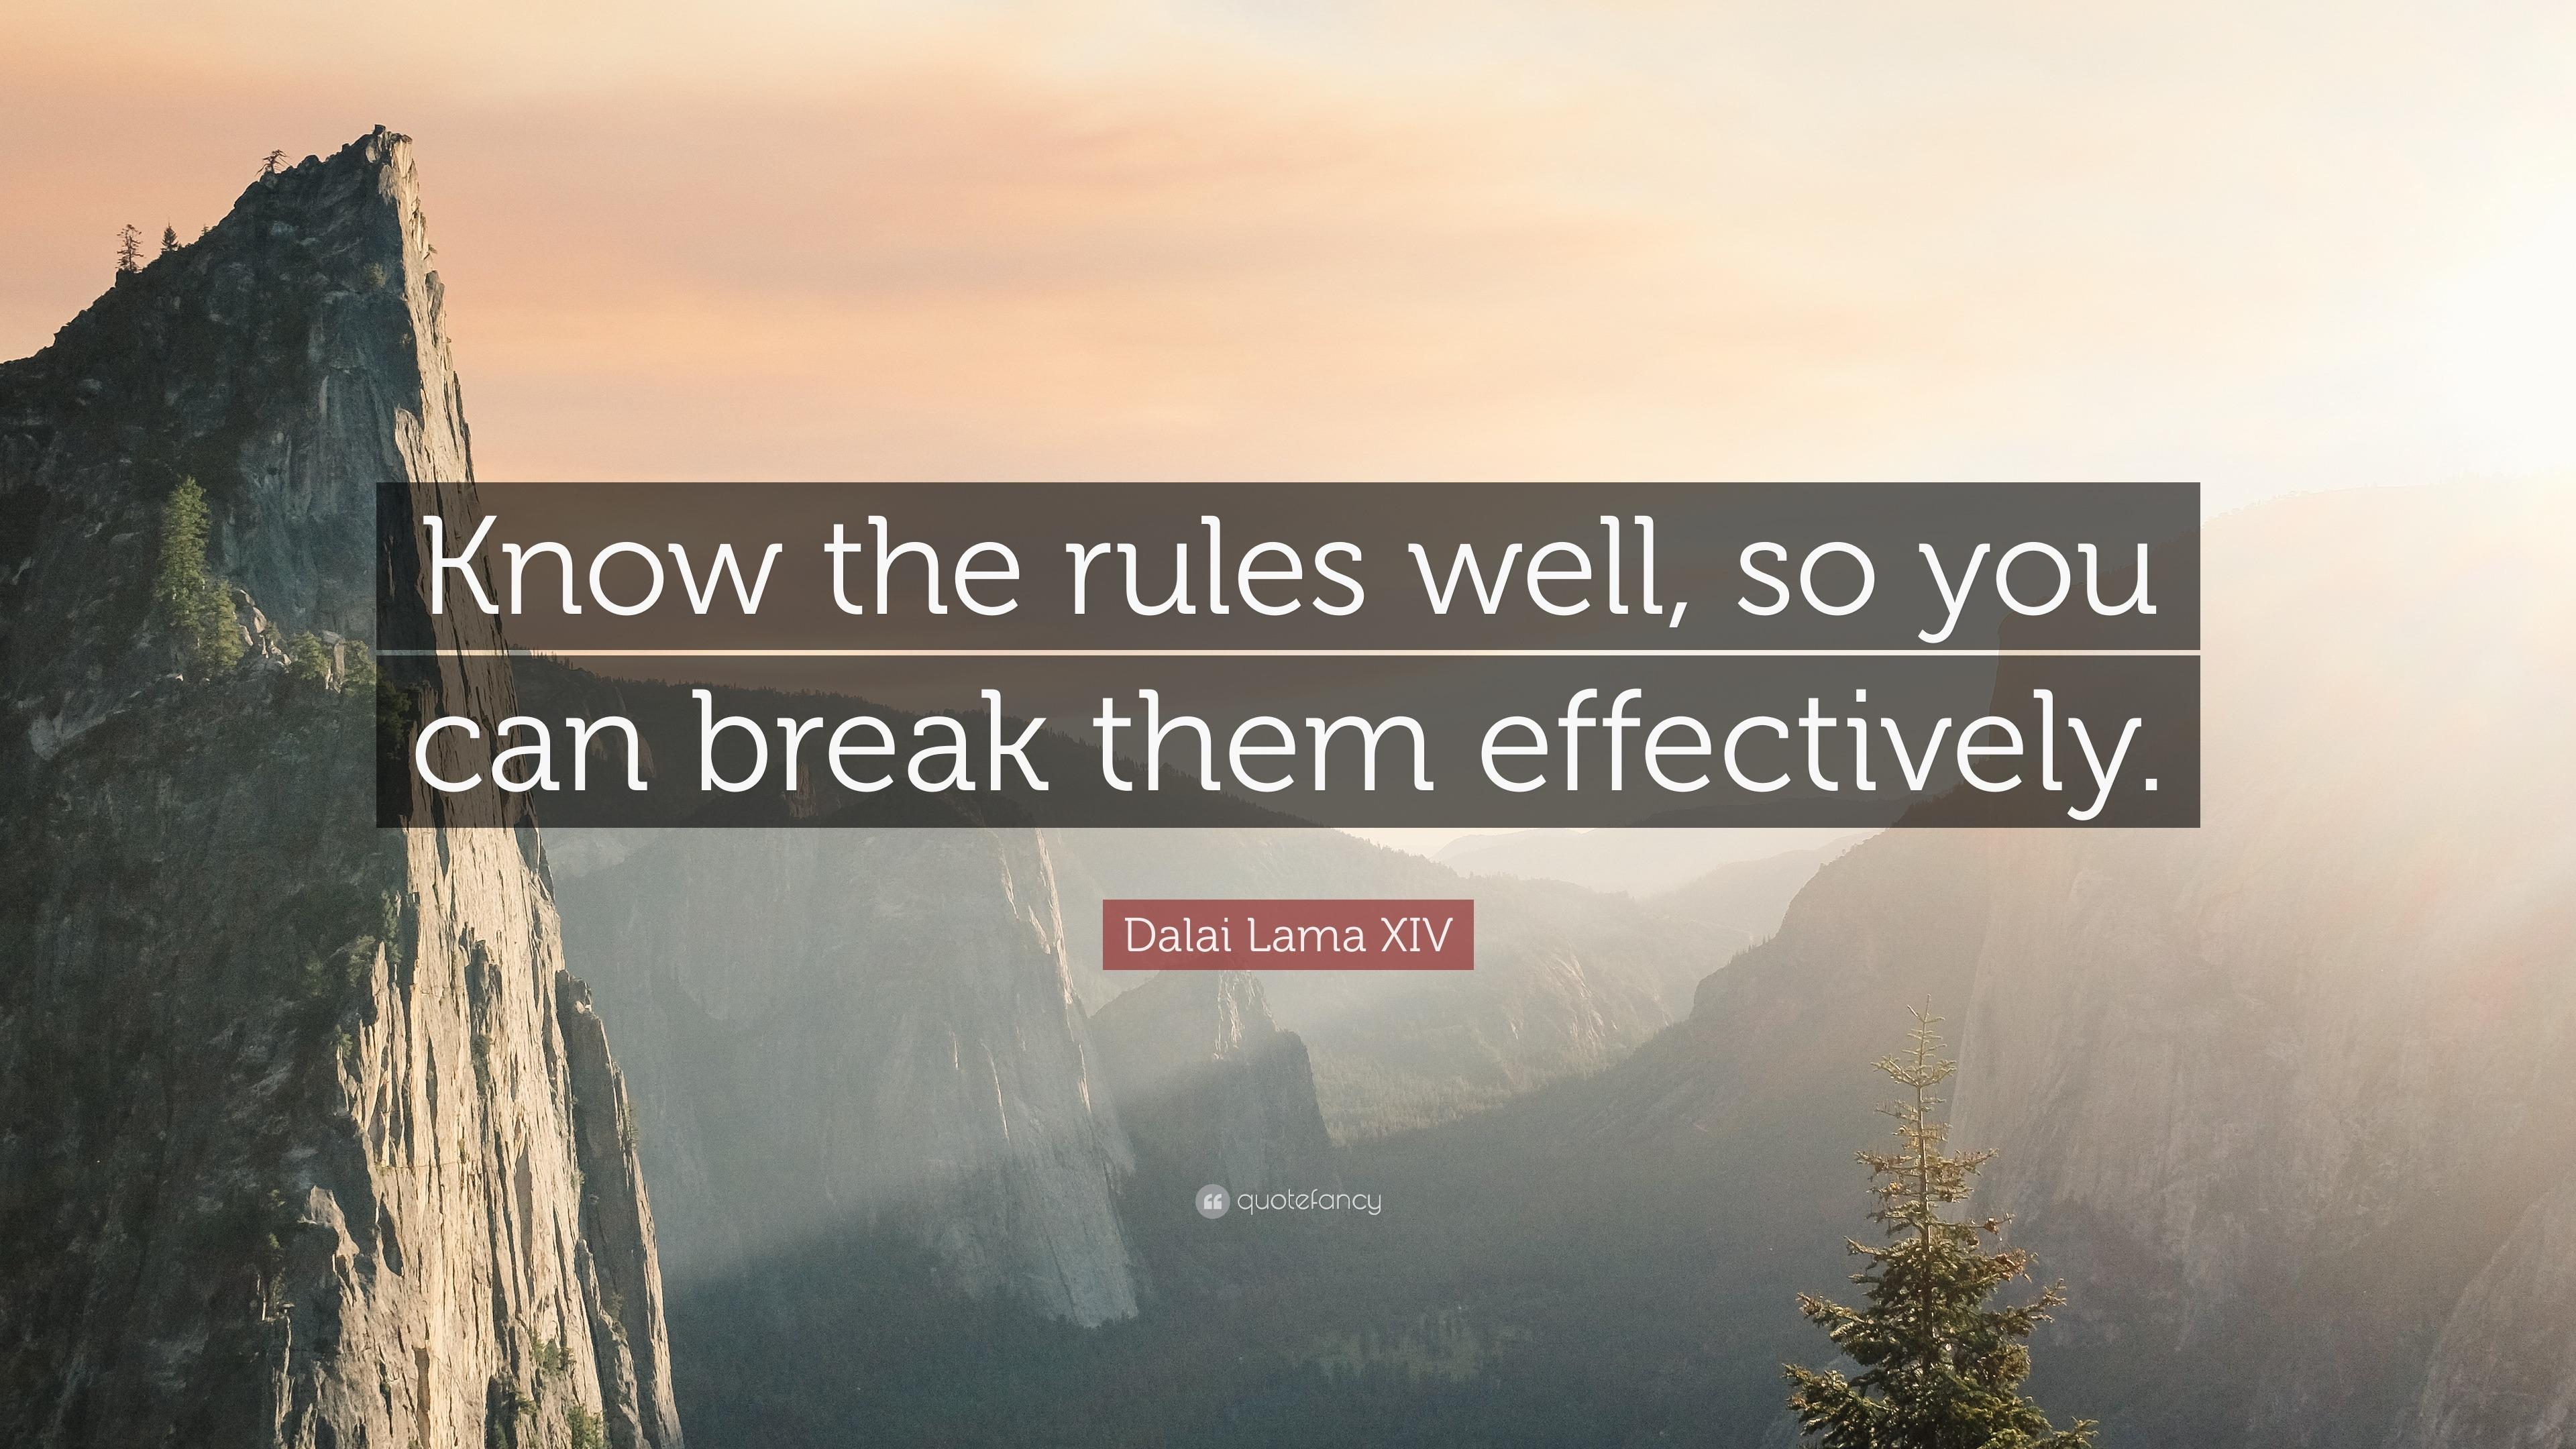 Dalai Lama Wallpaper Quotes Dalai Lama Xiv Quote Know The Rules Well So You Can